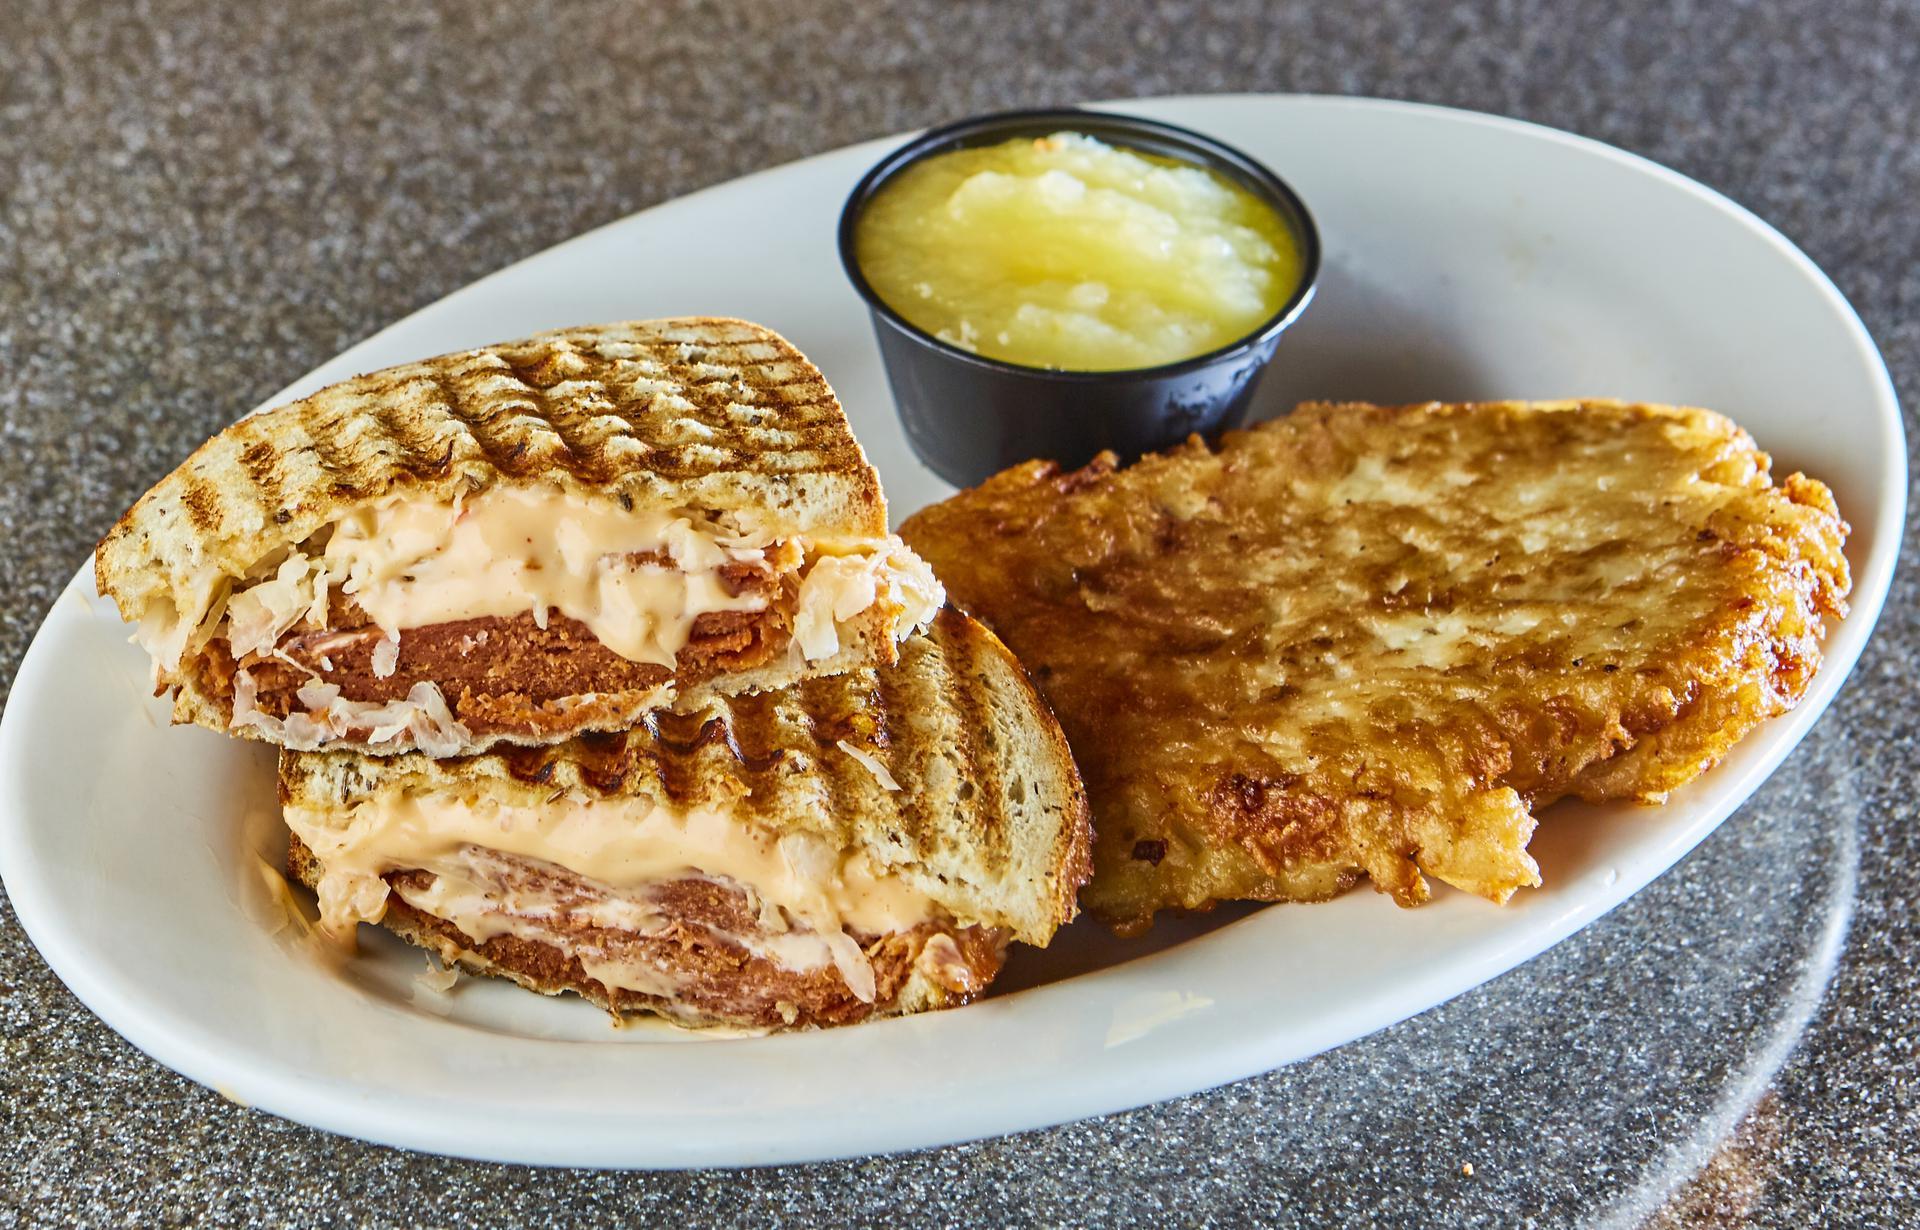 Ben's NEW Plant-Based Reuben Sandwich